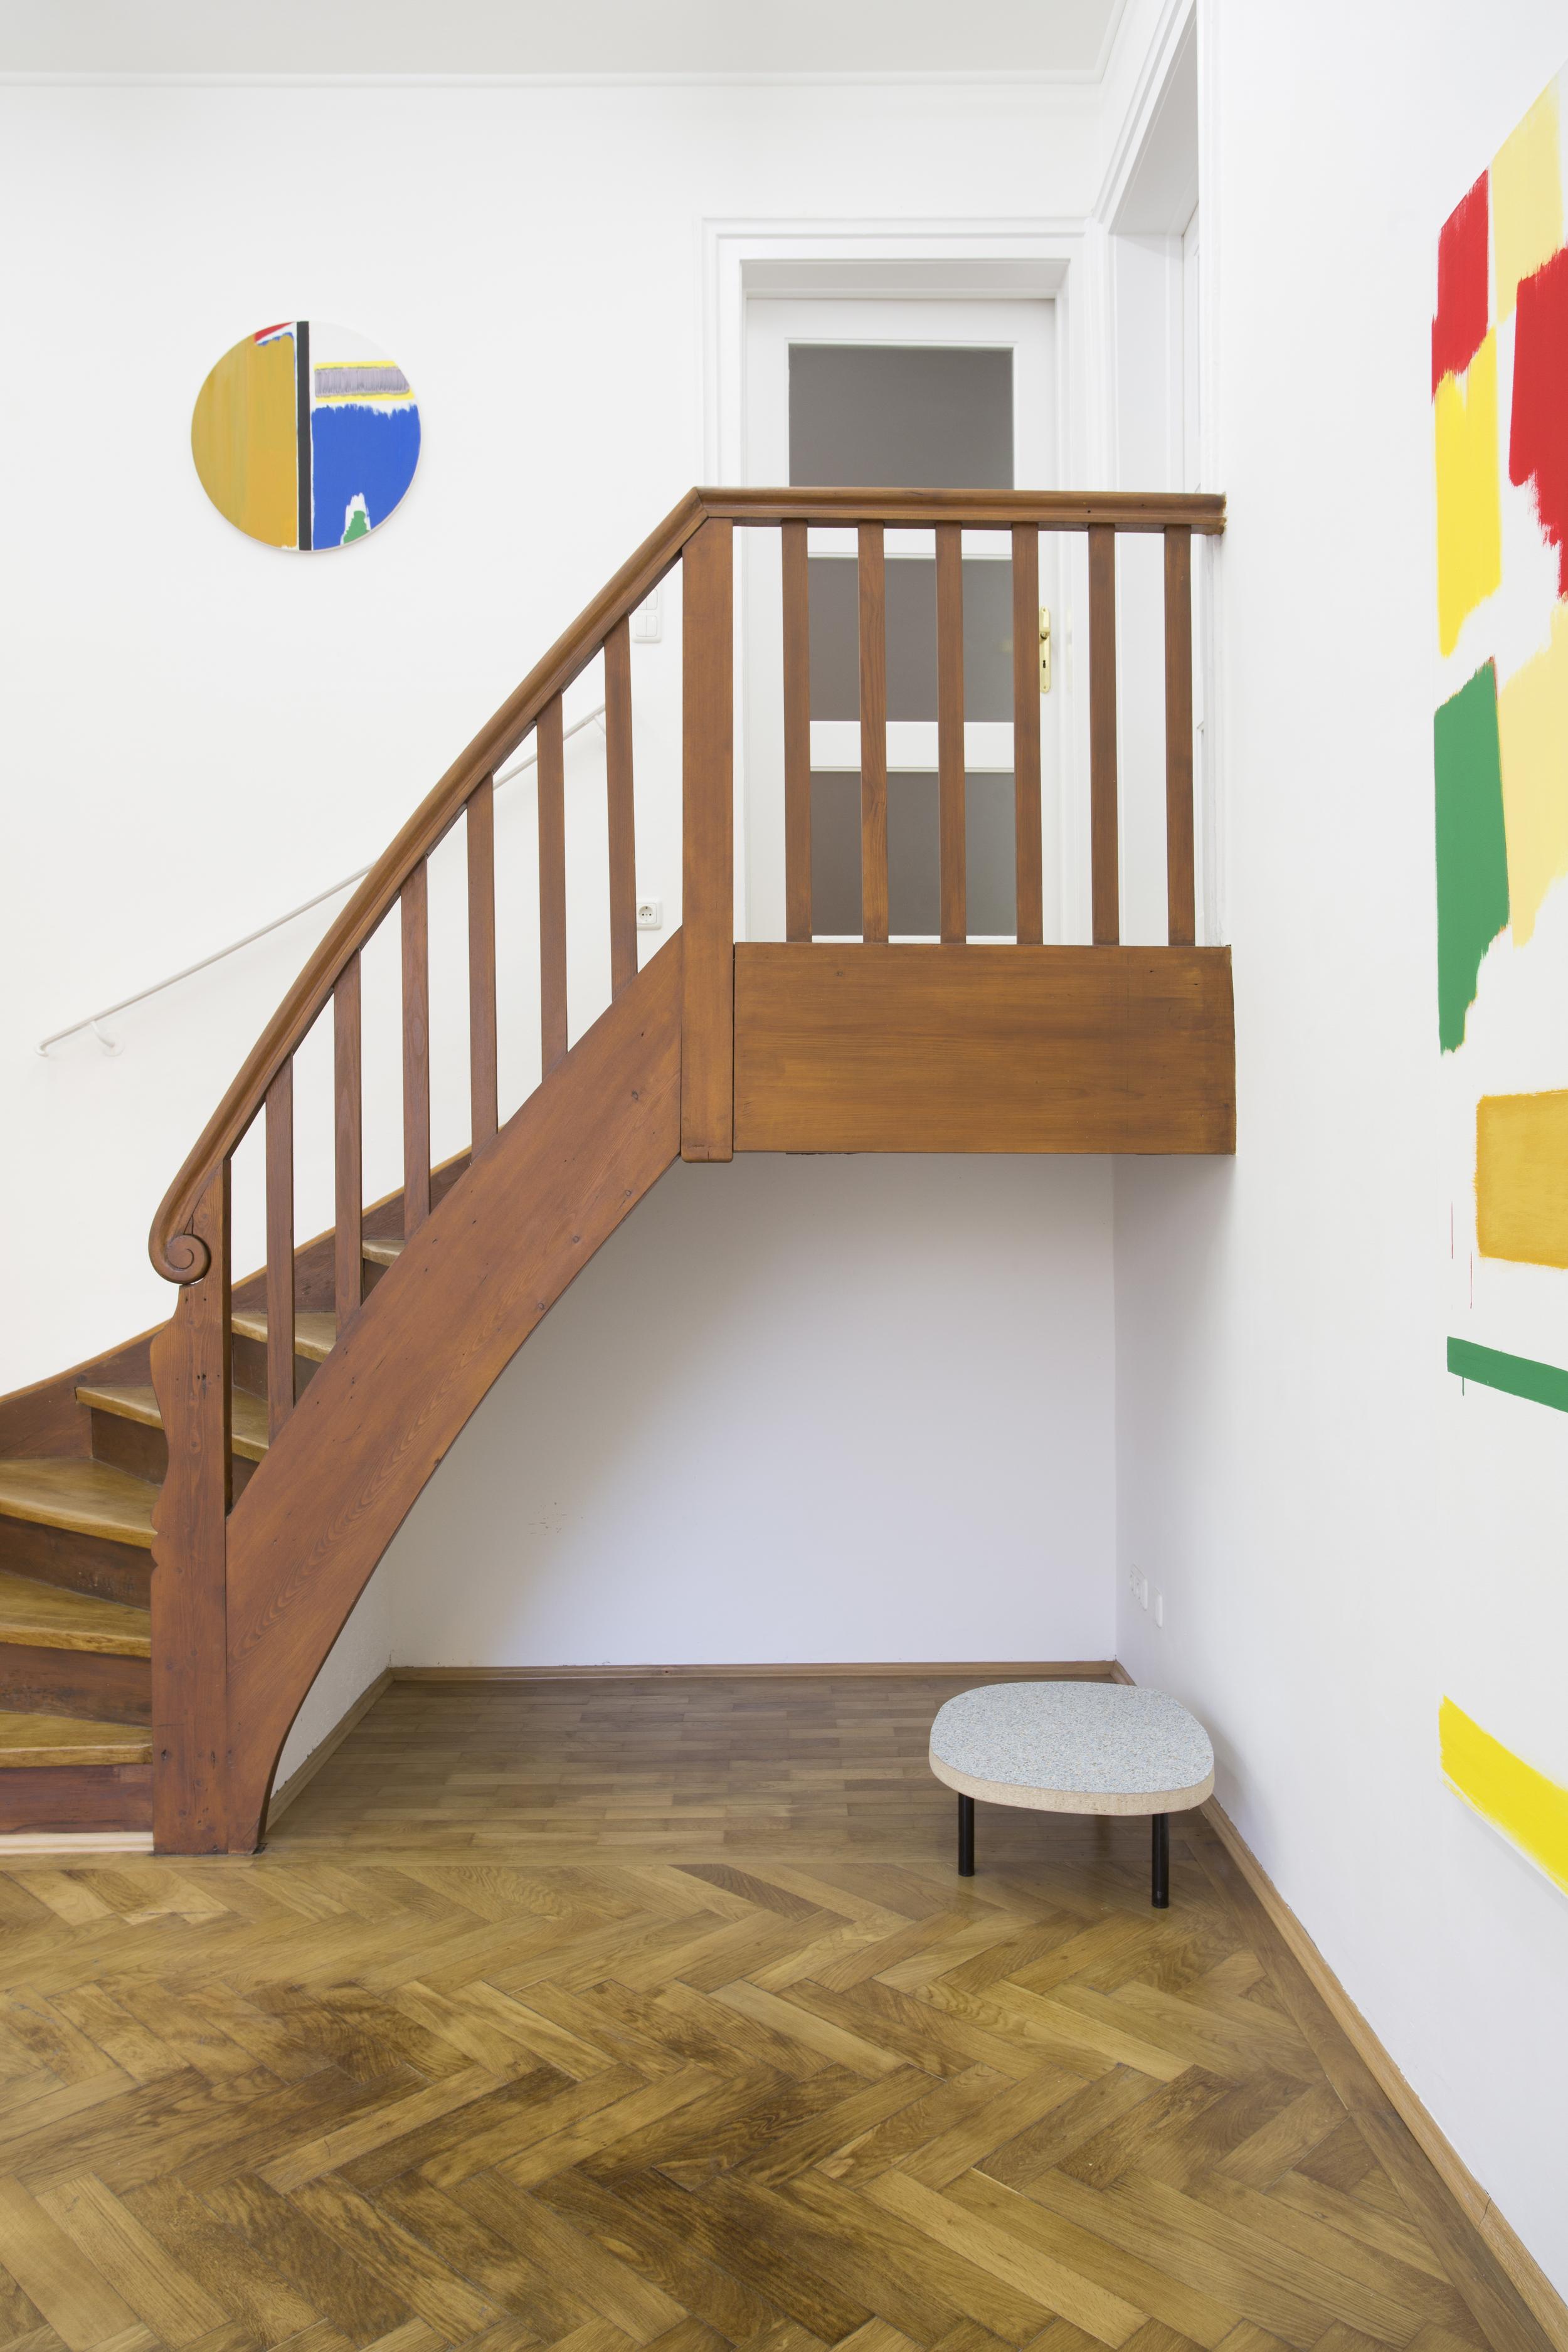 Elvire Bonduelle - waiting room #4 - installation view (Bernard Piffaretti, Elvire Bonduelle)